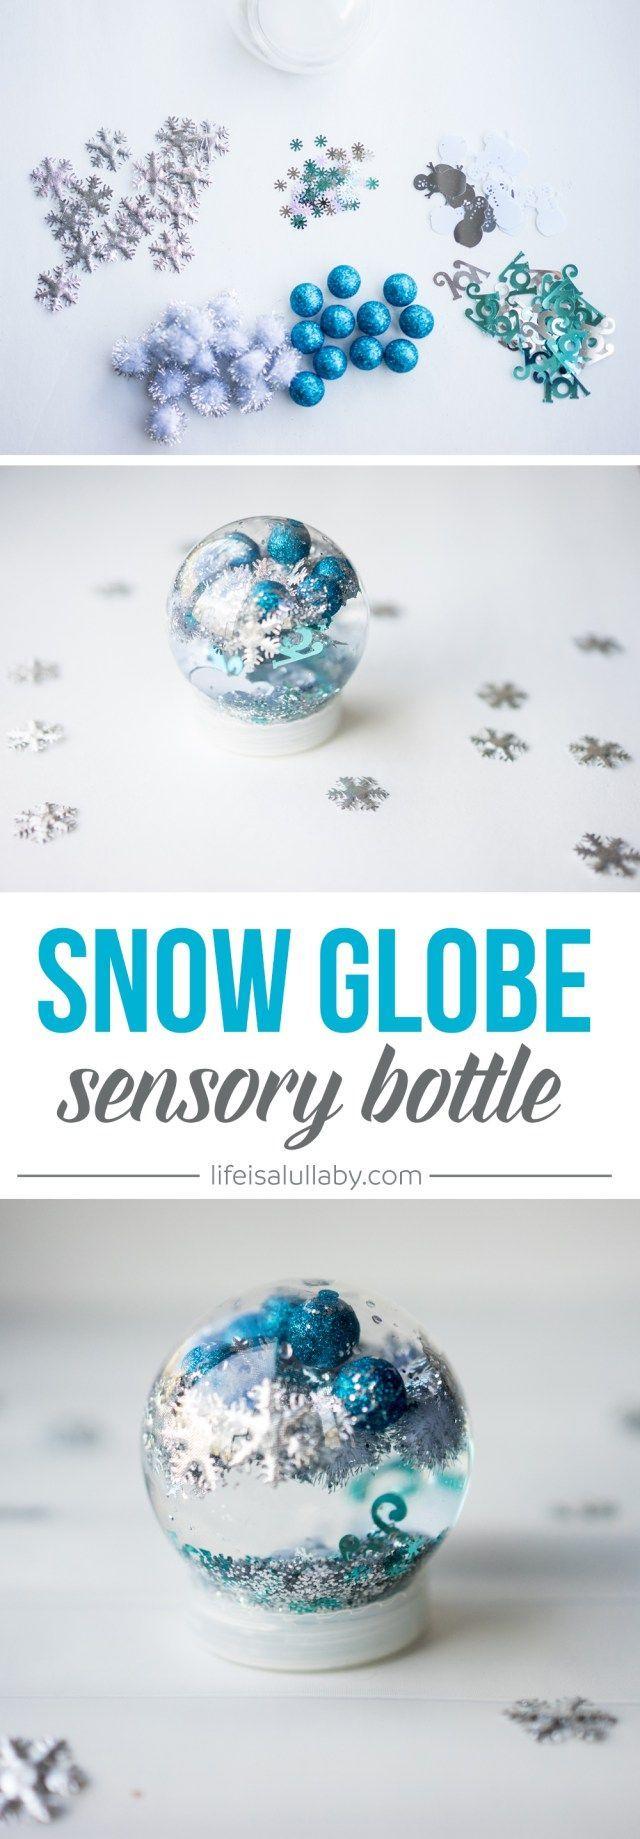 Snow Globe Christmas Sensory